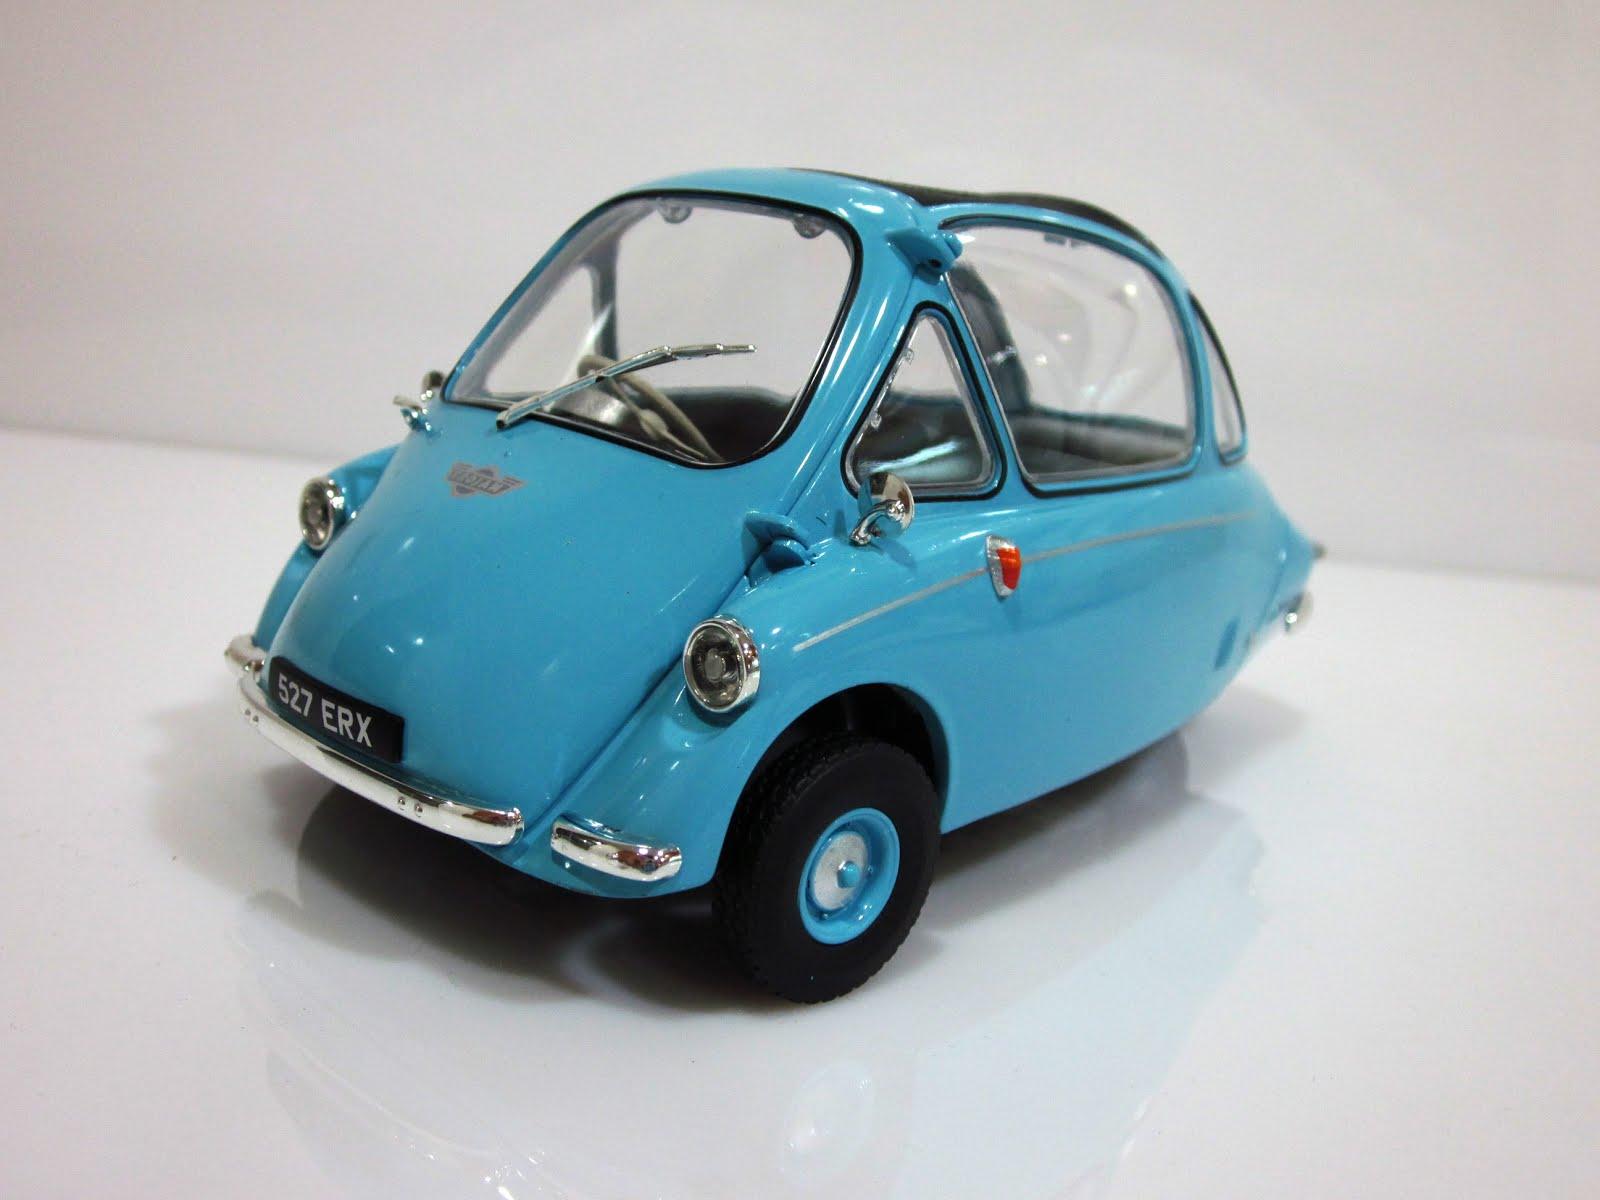 Heinkel Trojan '56 - Oxford